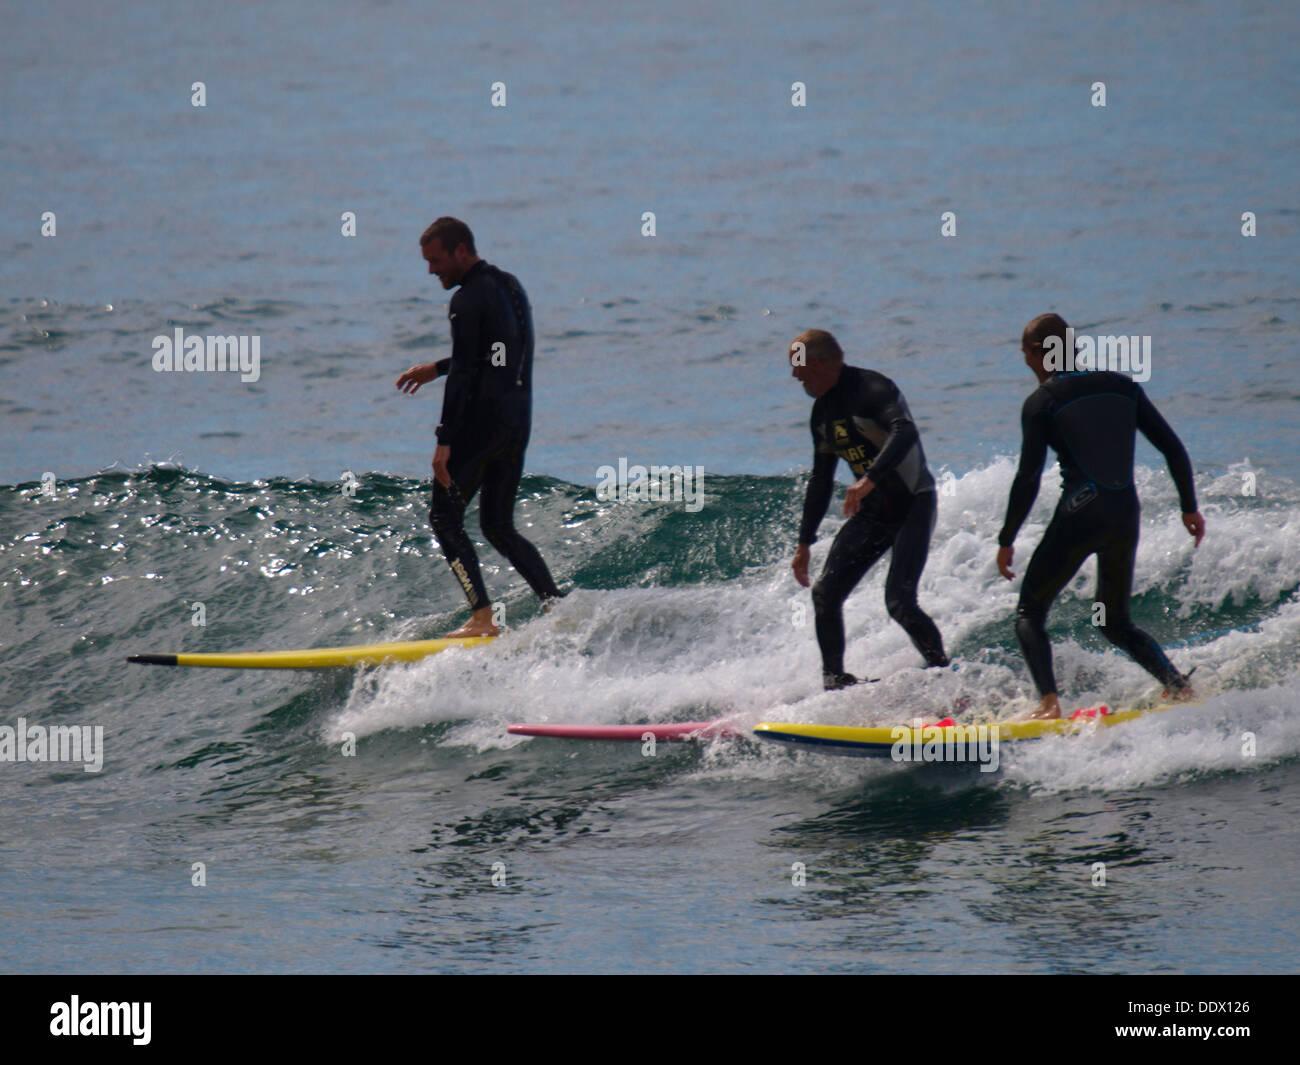 Three surfers on the same wave, Trebarwith Strand, Cornwall, UK 2013 - Stock Image